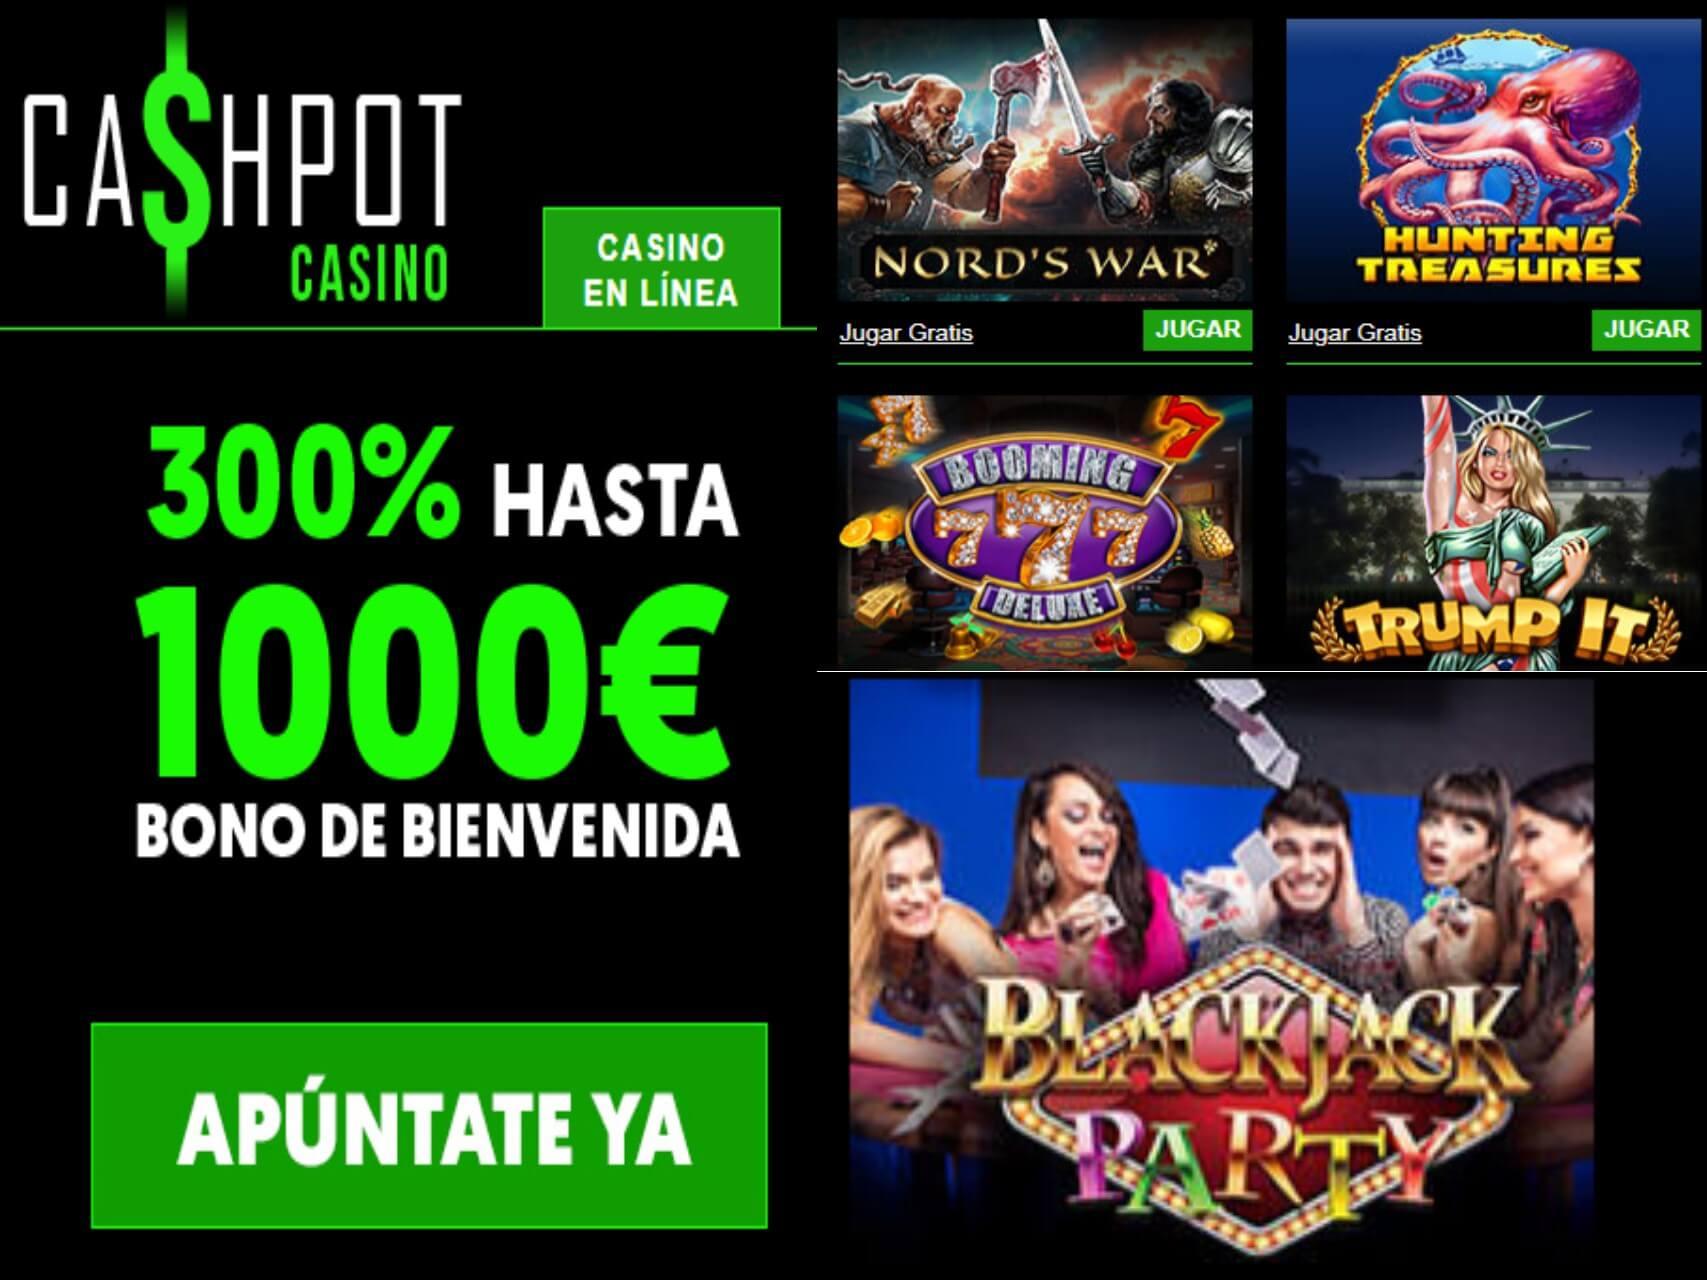 Obtenga 300% promocionales de bienvenida Casino Cashpot